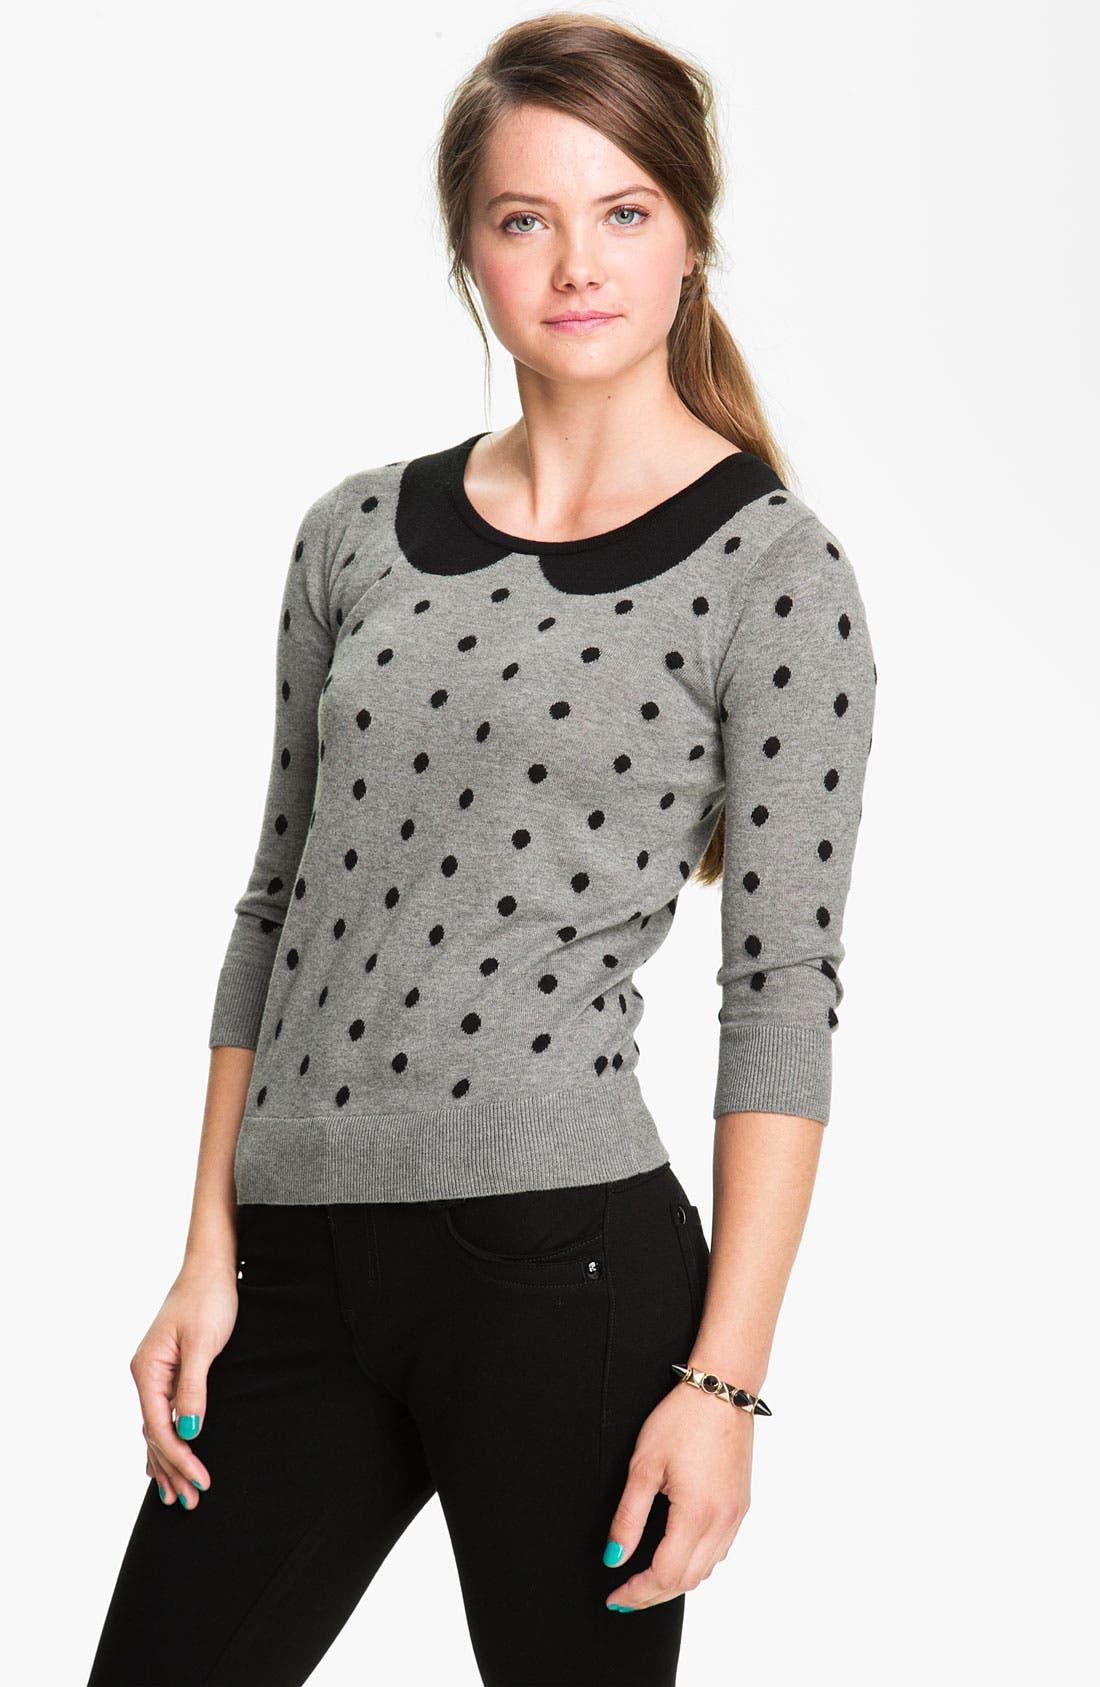 Alternate Image 1 Selected - Frenchi® Polka Dot Peter Pan Sweater (Juniors)